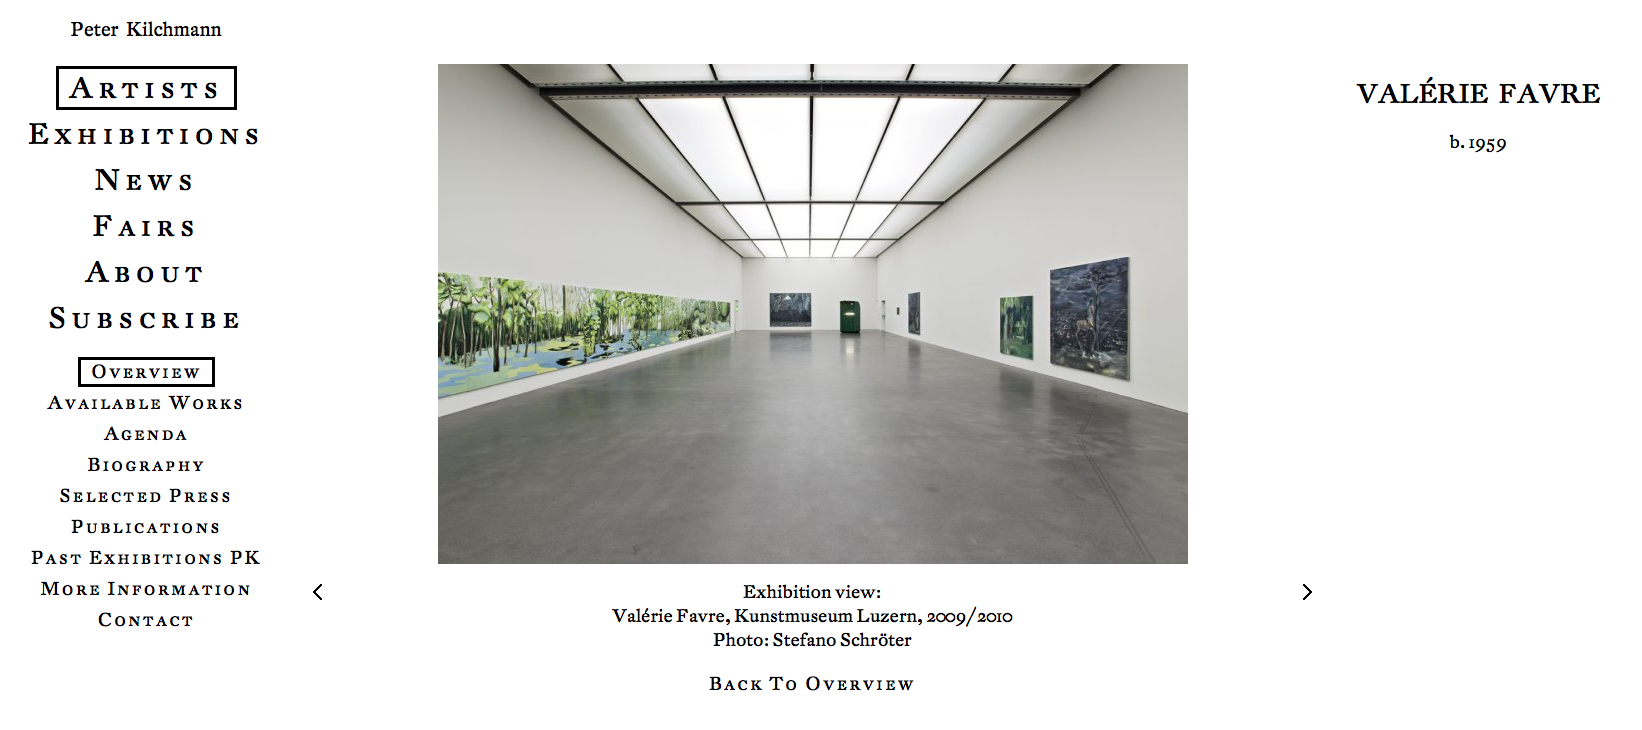 Valérie Favre, Kunstmuseum Luzern, 2009/2010